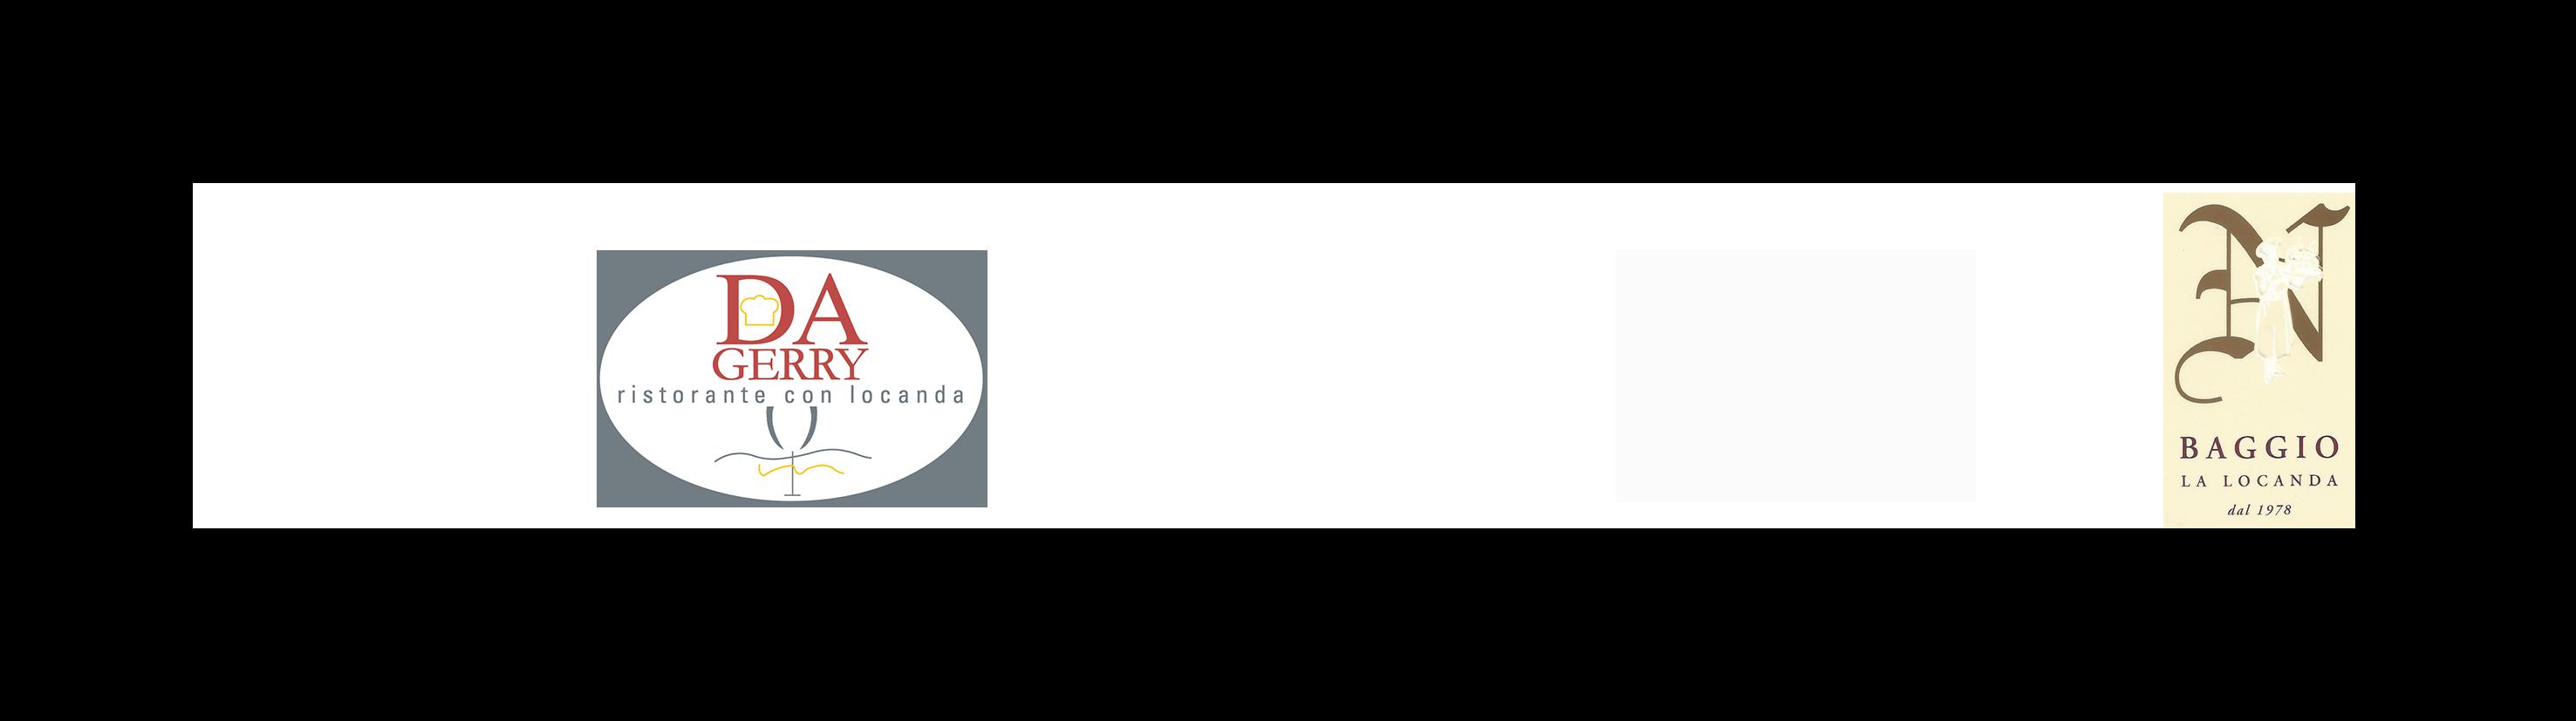 ristoranti 2017